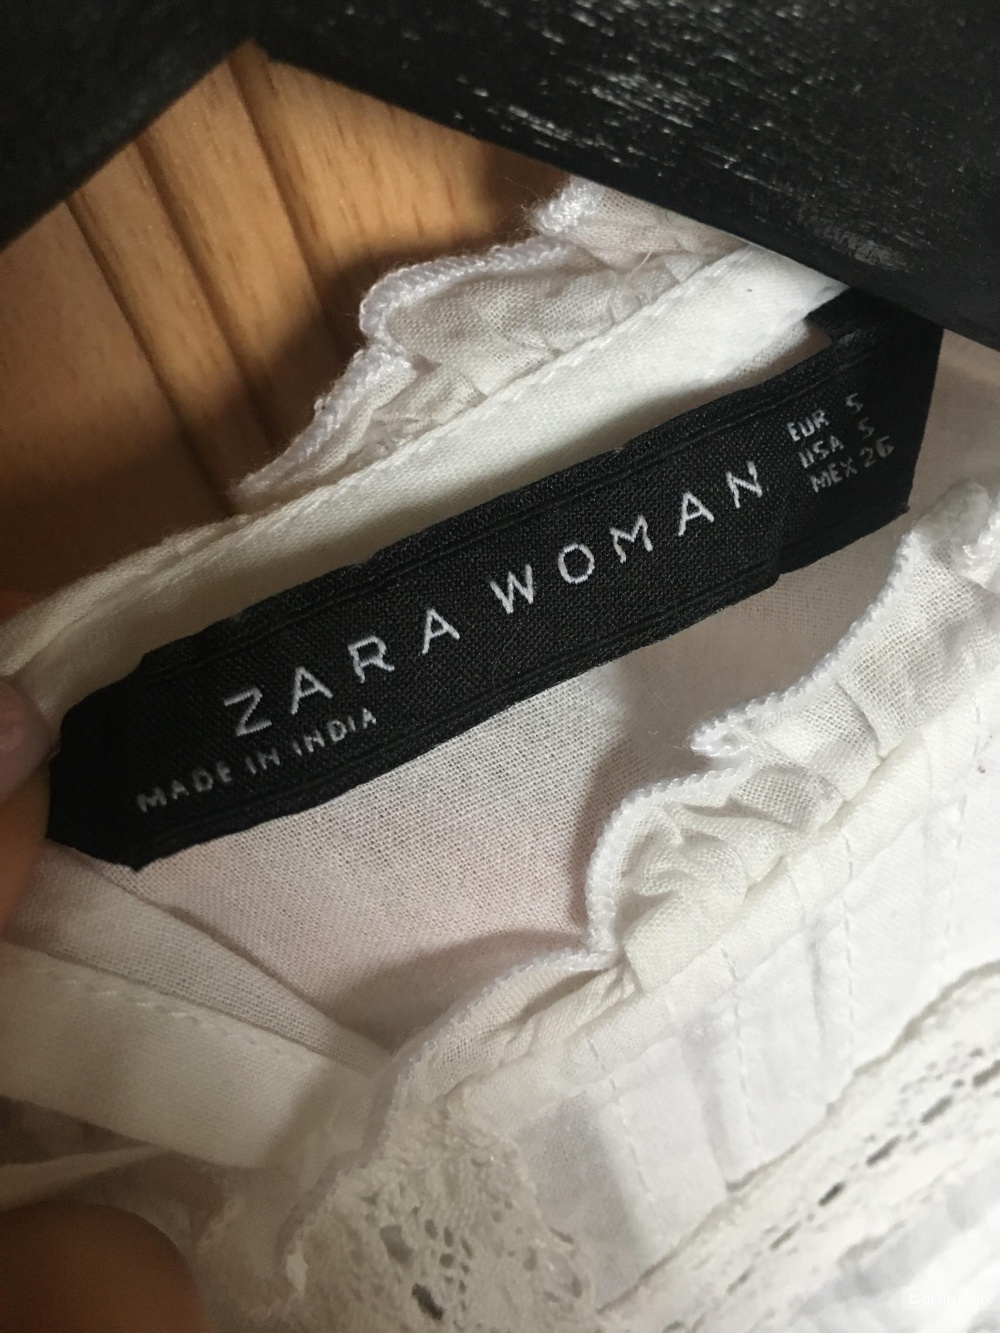 Топ Zara Woman размер S